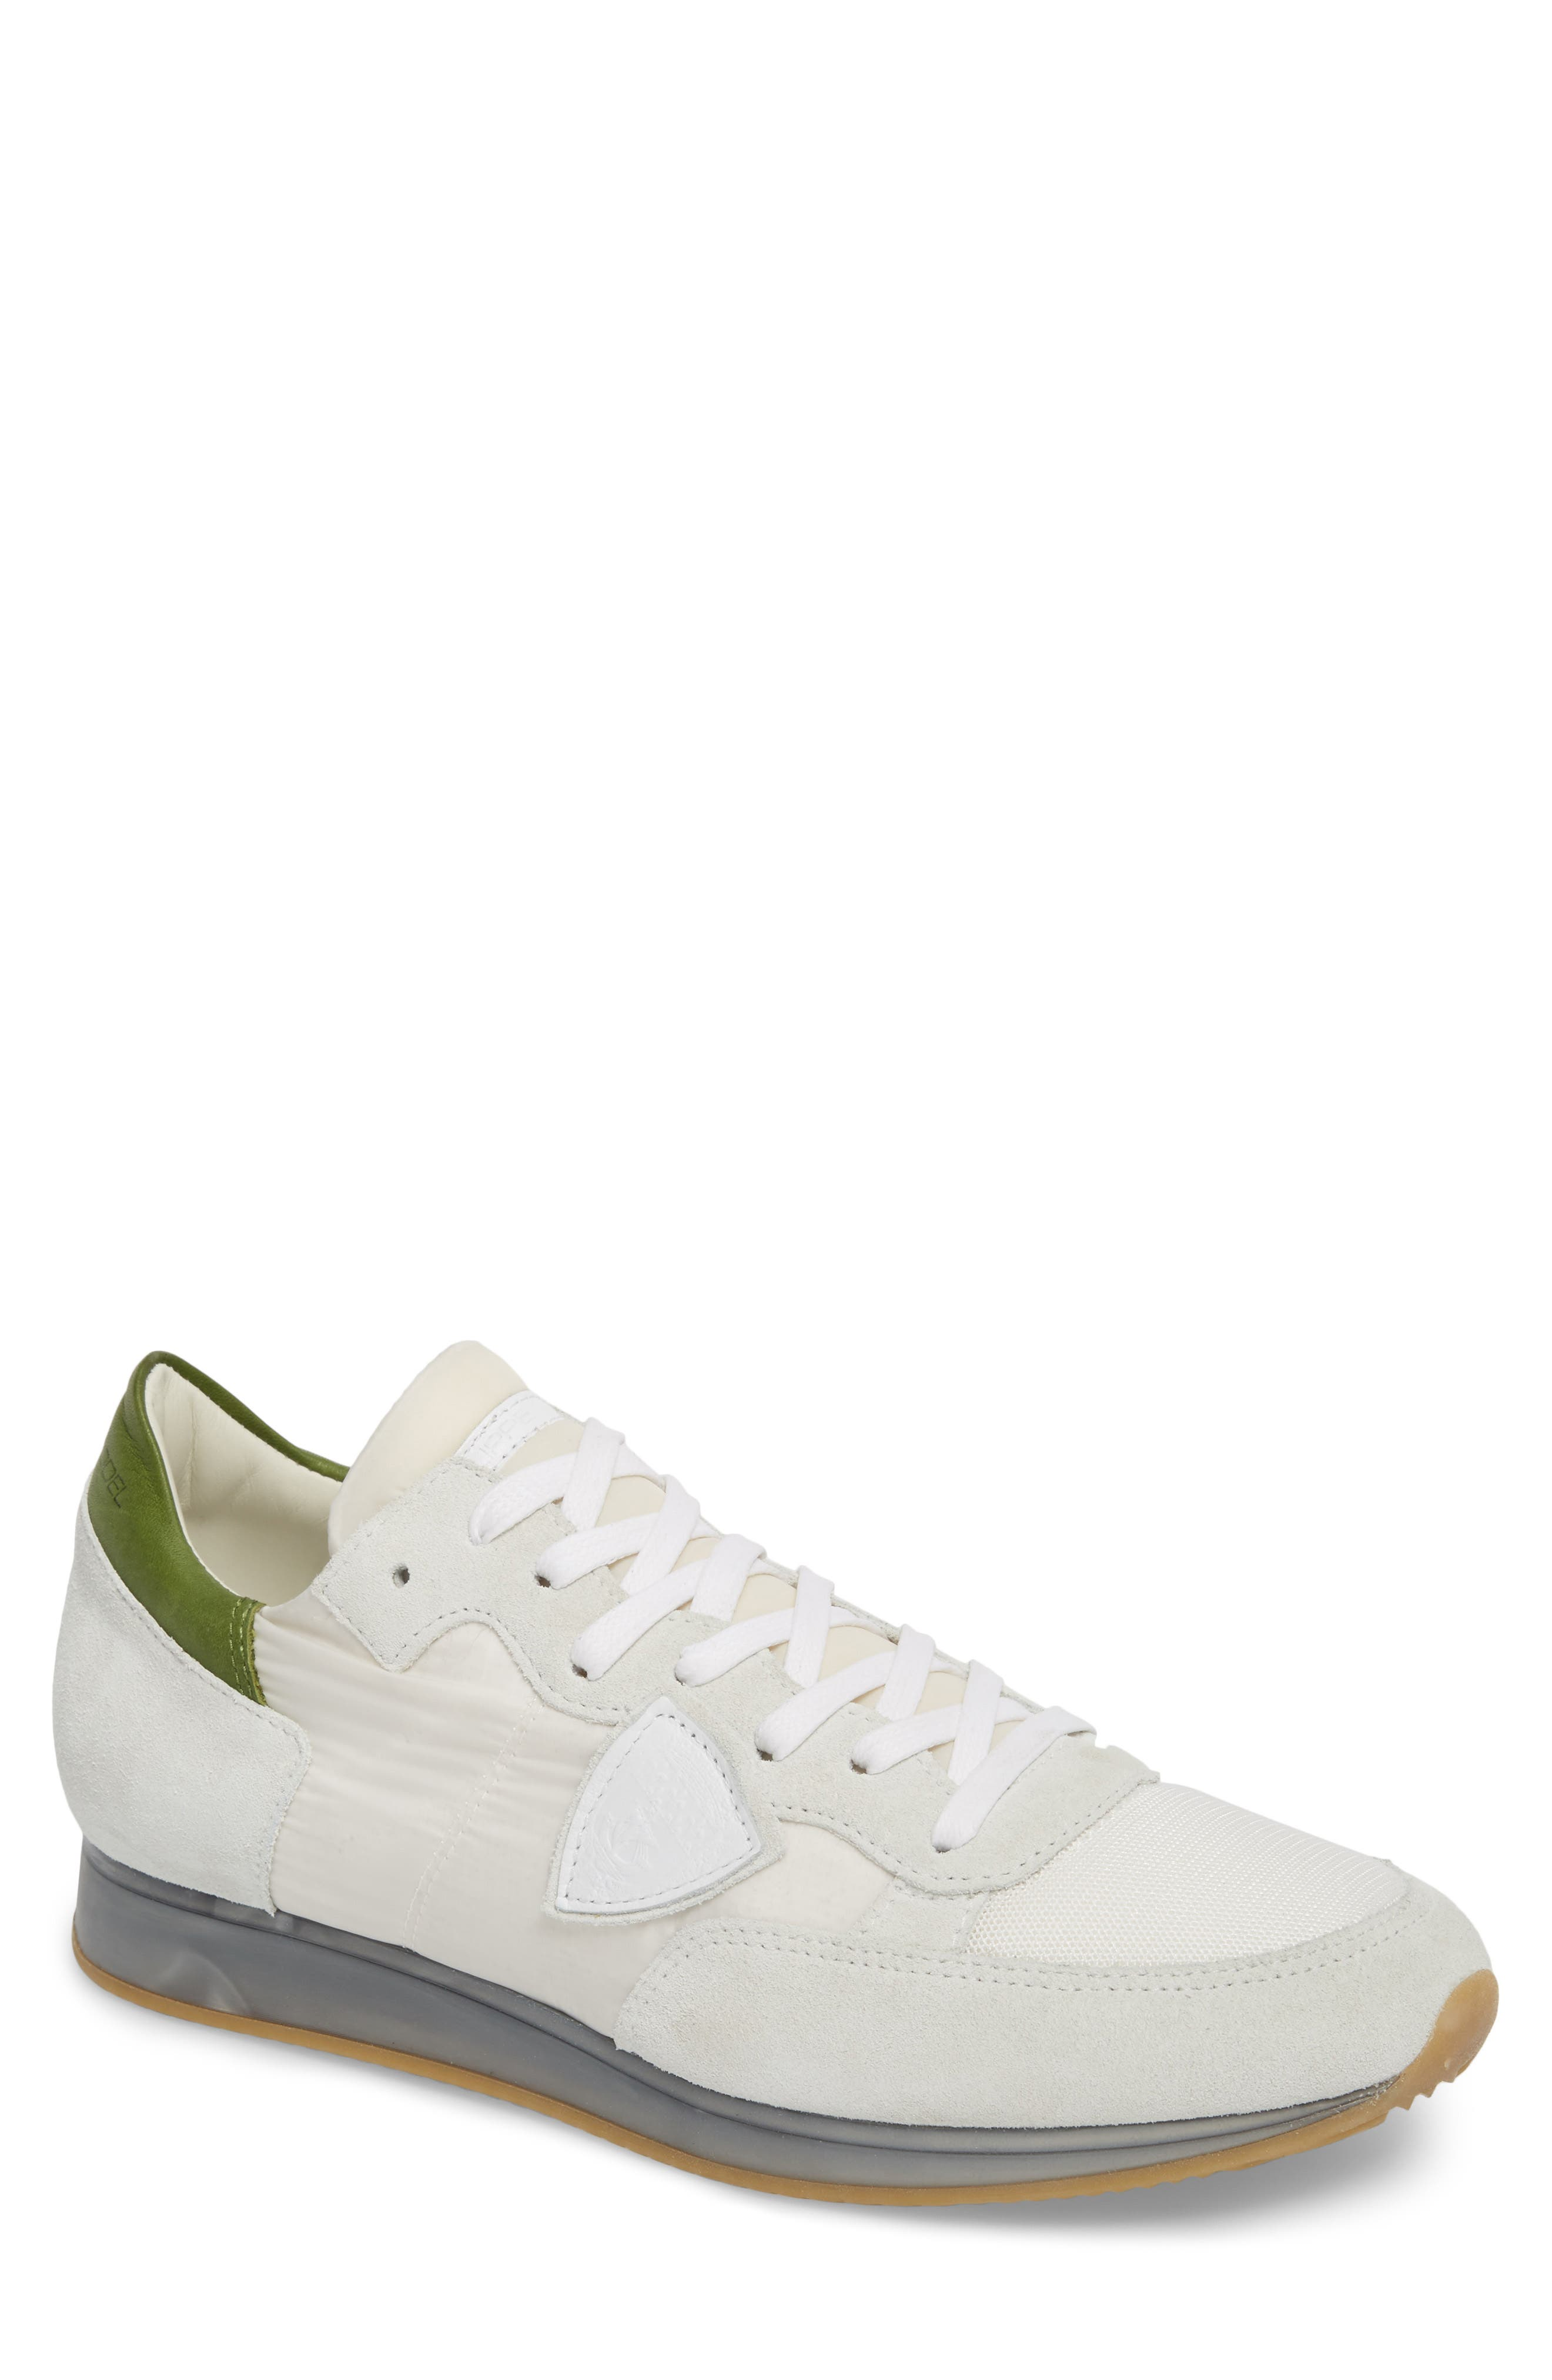 Tropez Sneaker,                         Main,                         color, White/ Green